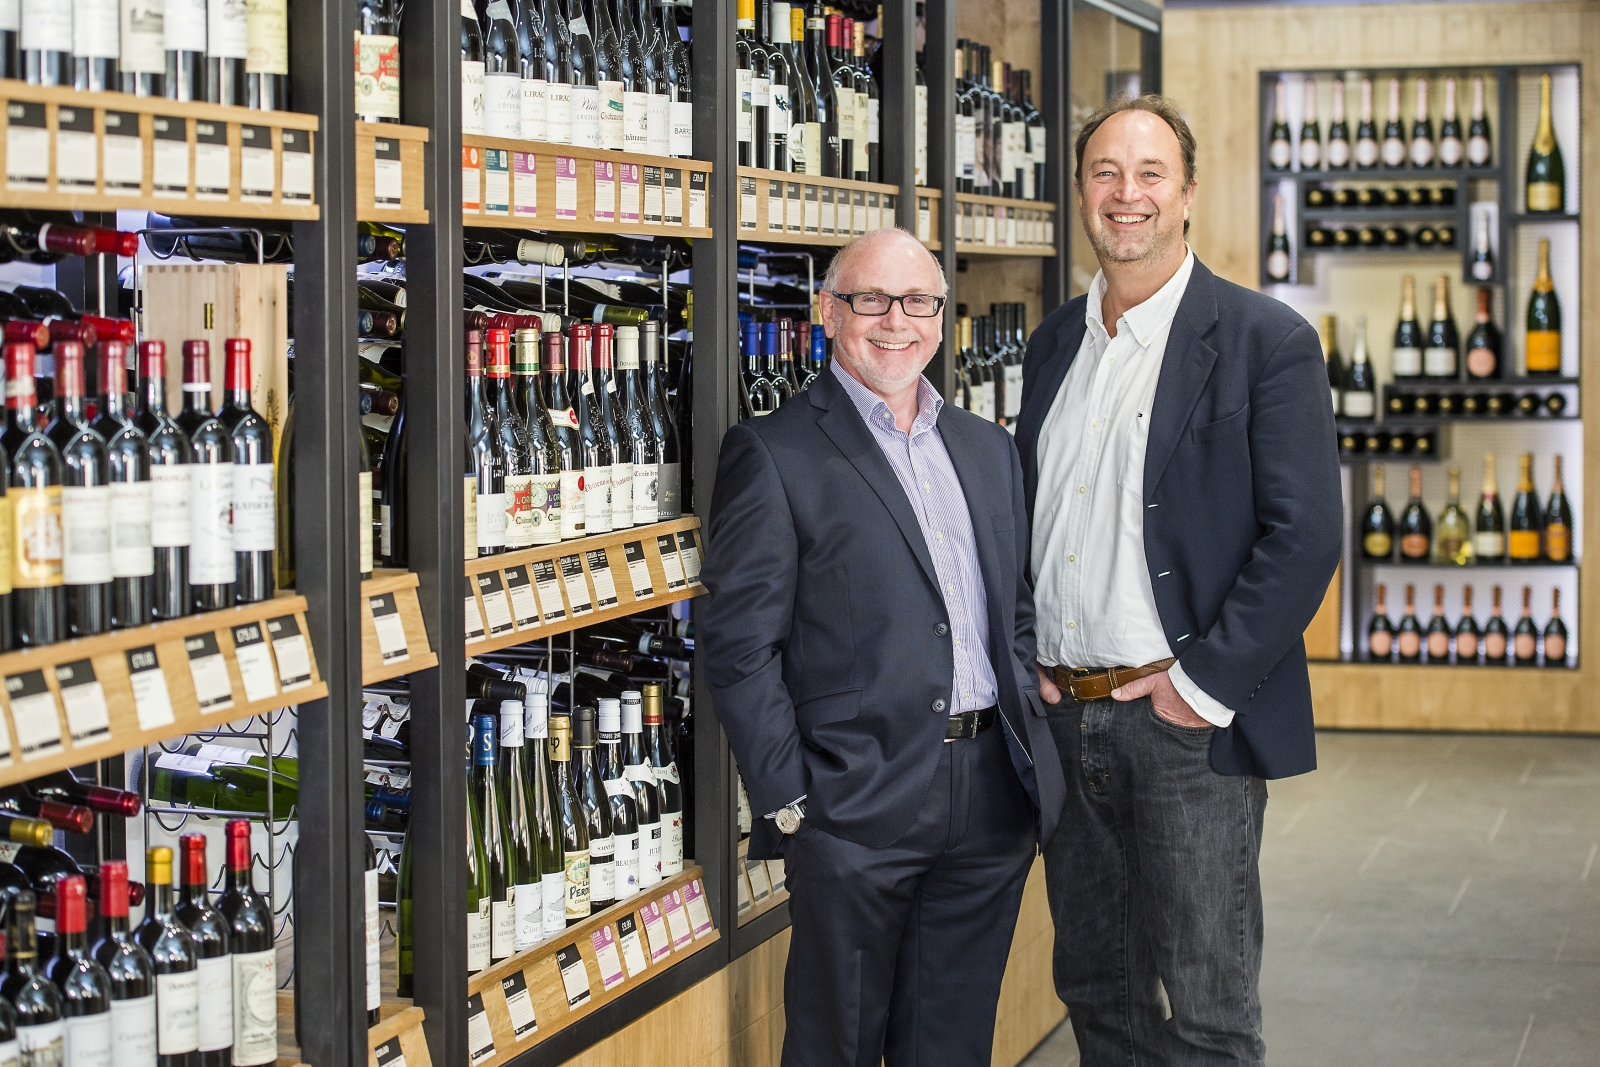 Phil Wrigley and Rowan Gormley